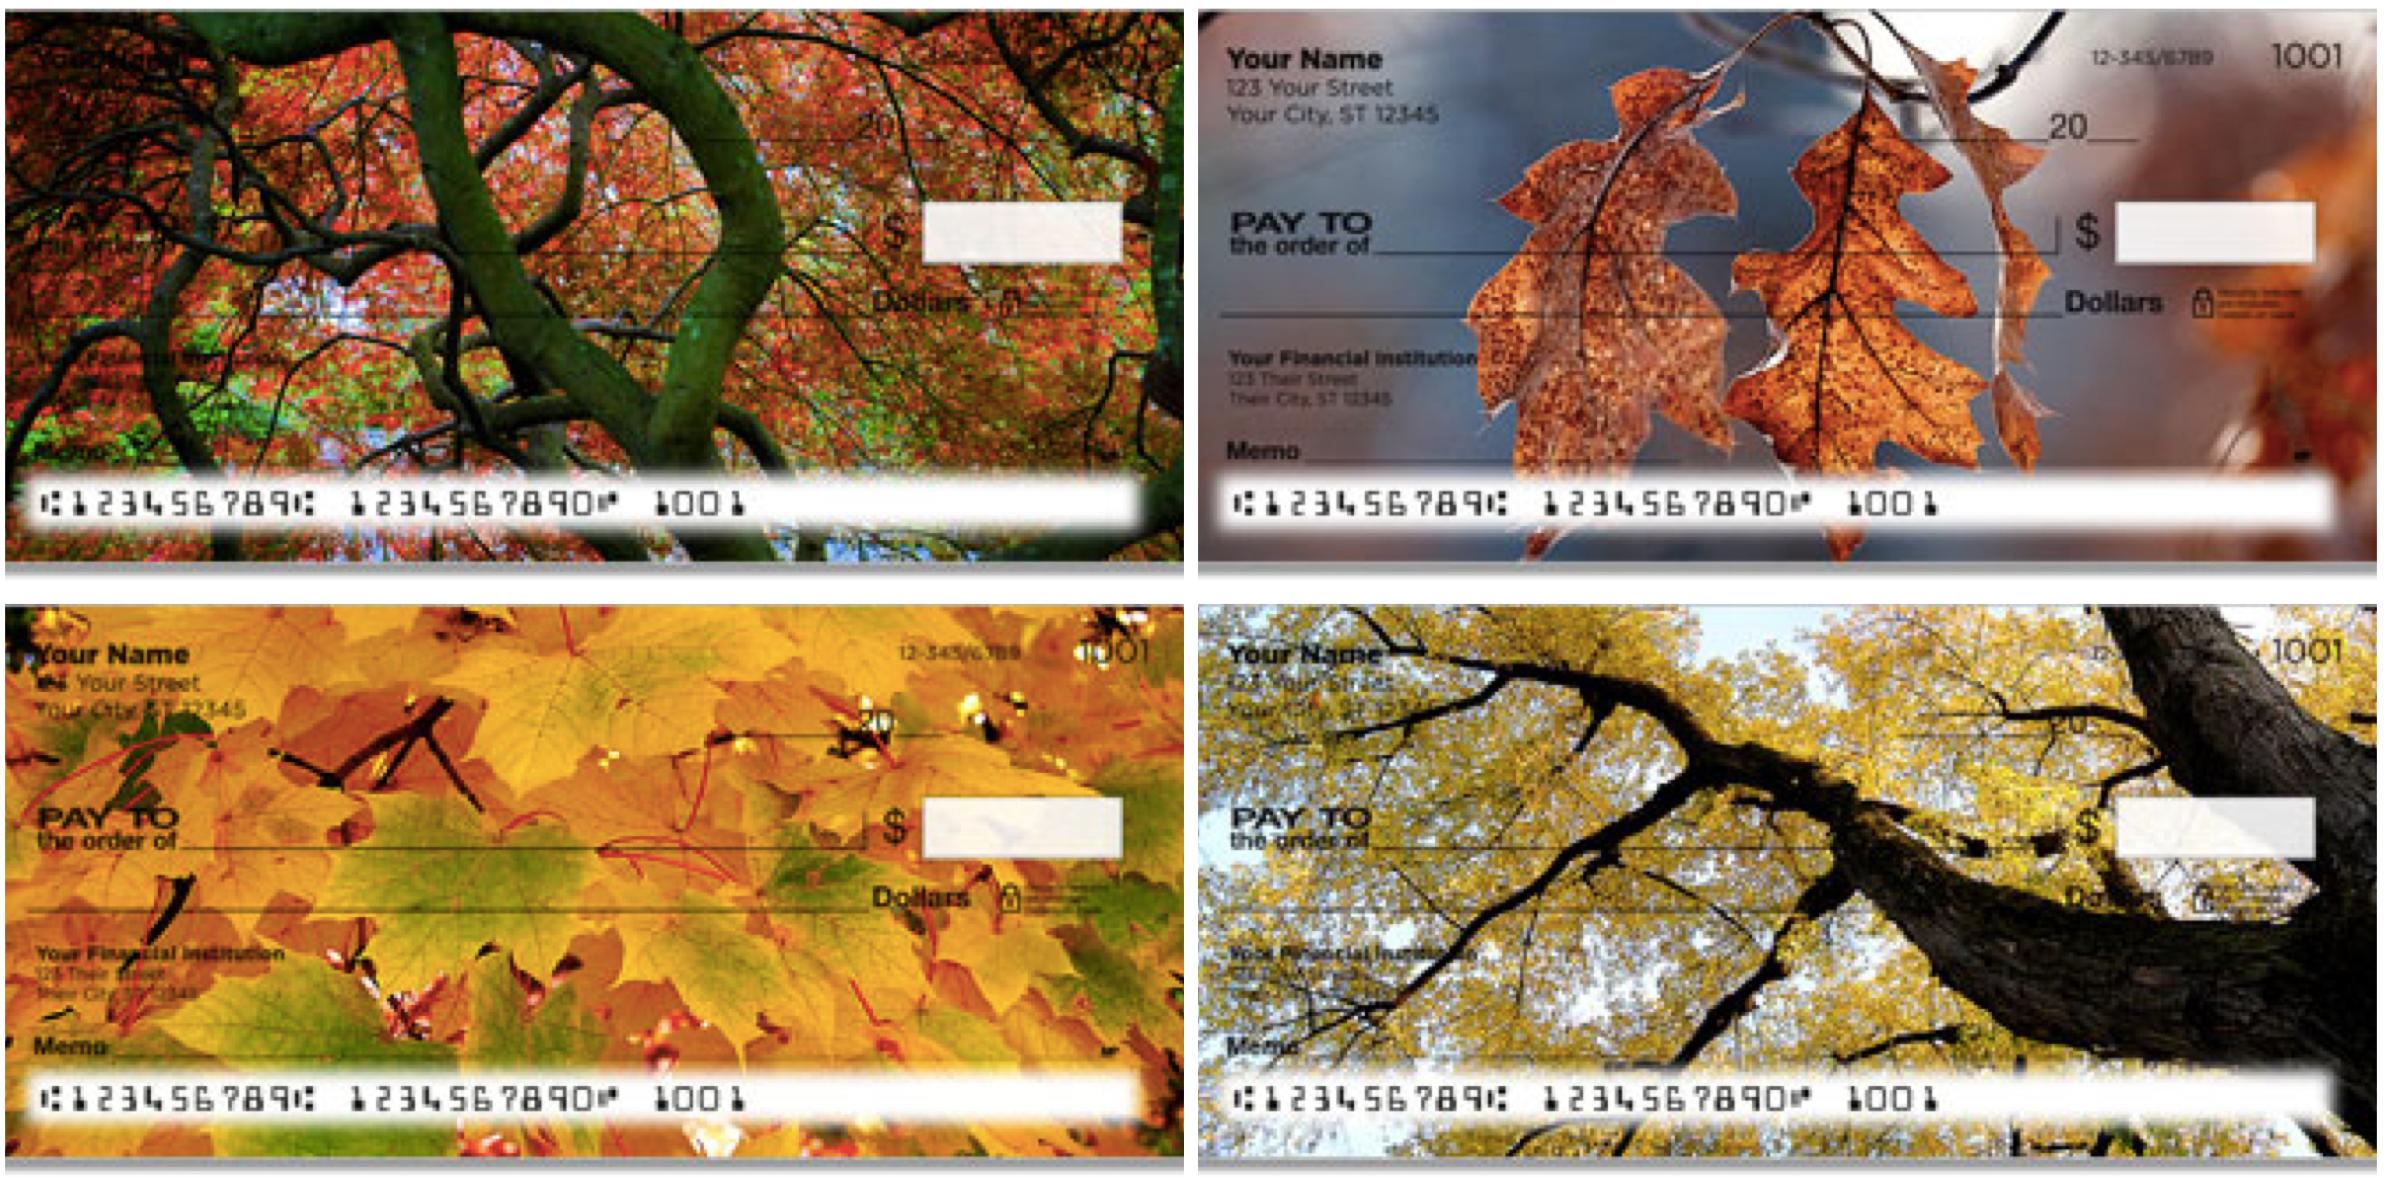 Colors of Fall Checks